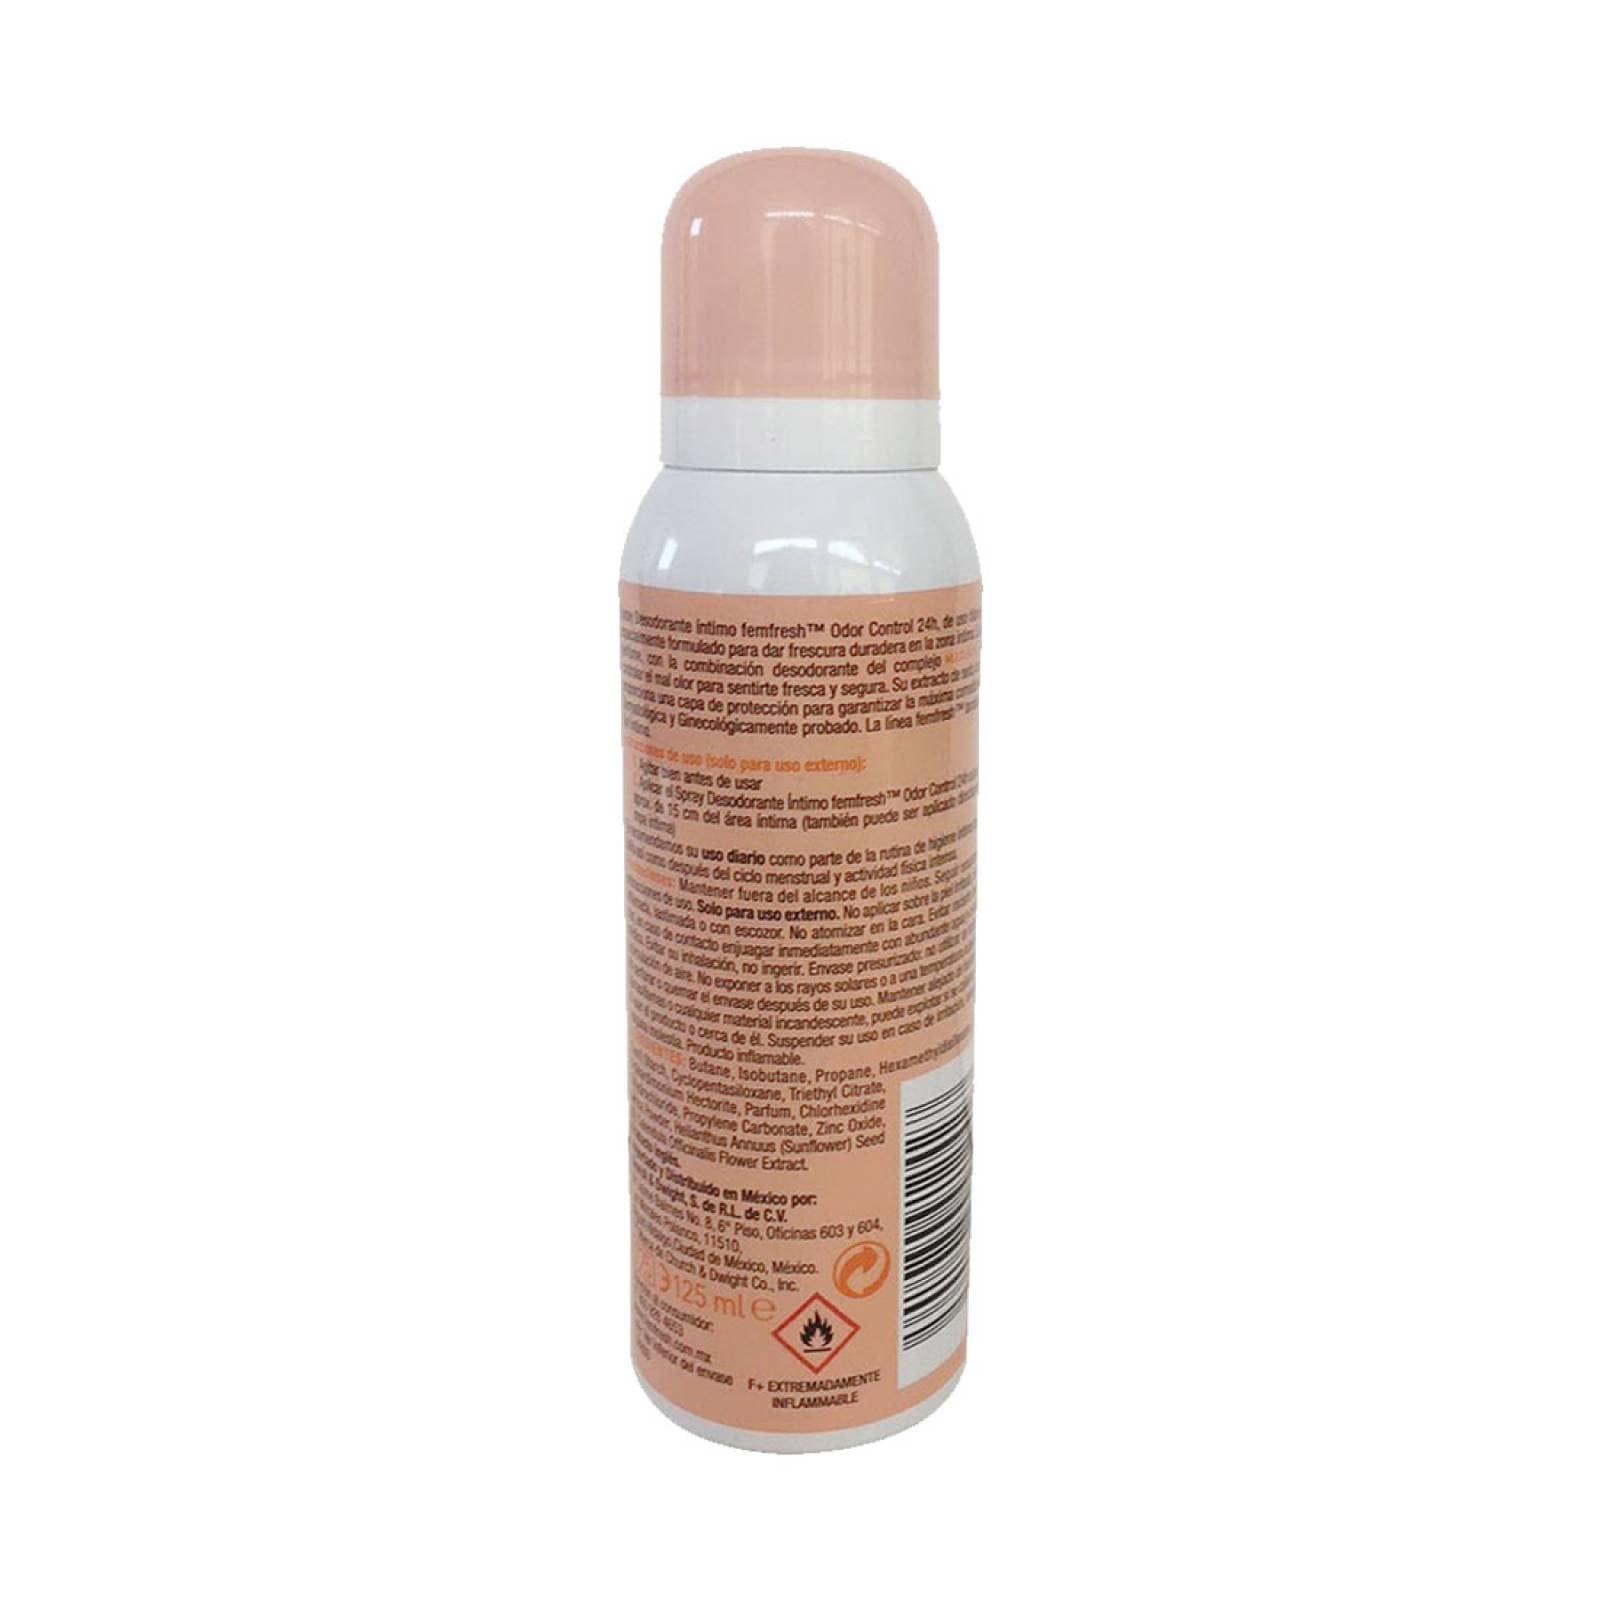 Higiene Íntima Femenina Spray Desodorante 125 ml Femfresh